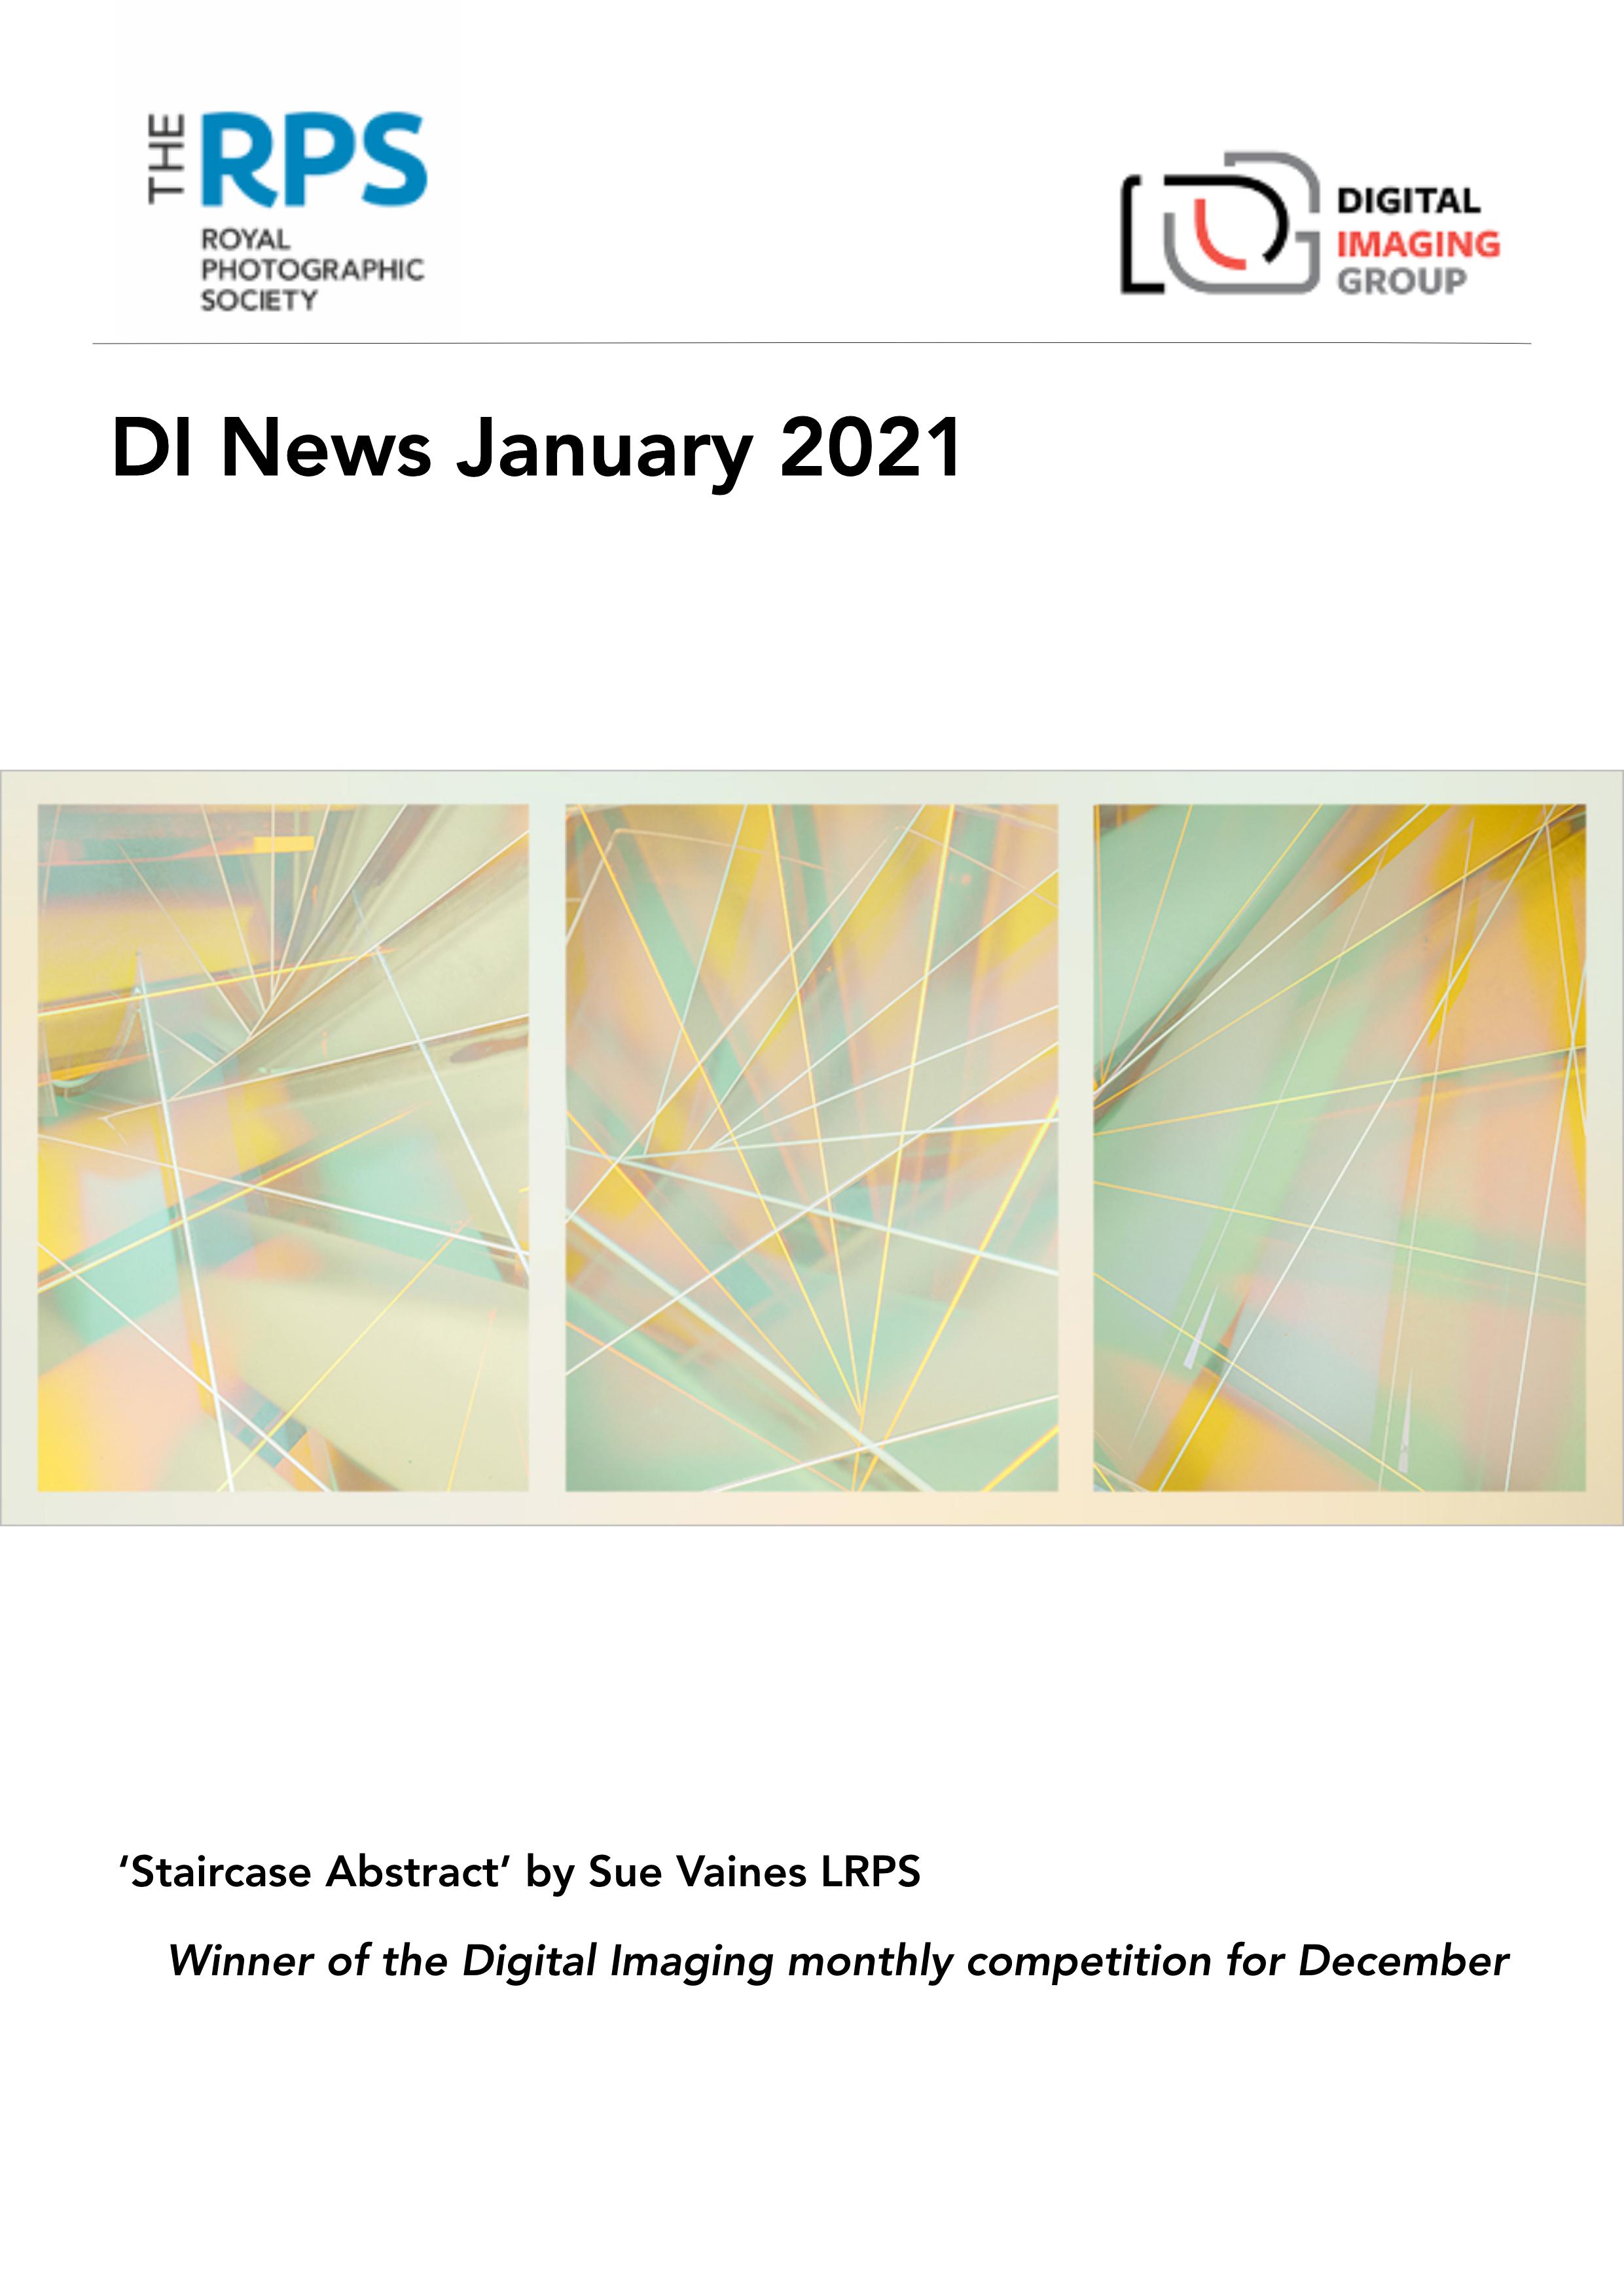 DI News January 2021